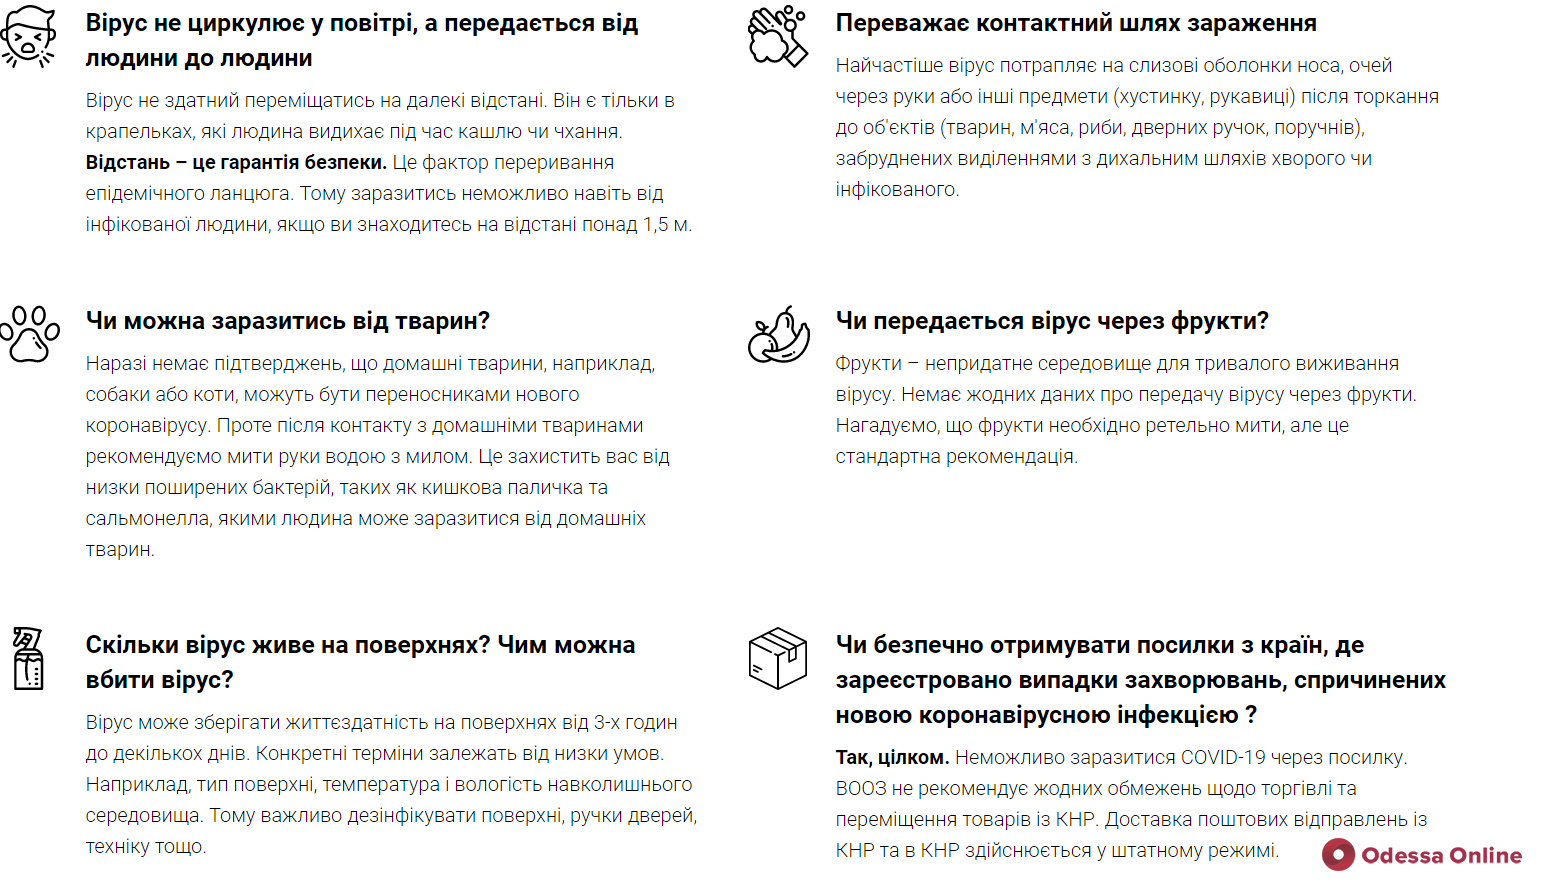 В Украине запустили сайт о коронавирусе